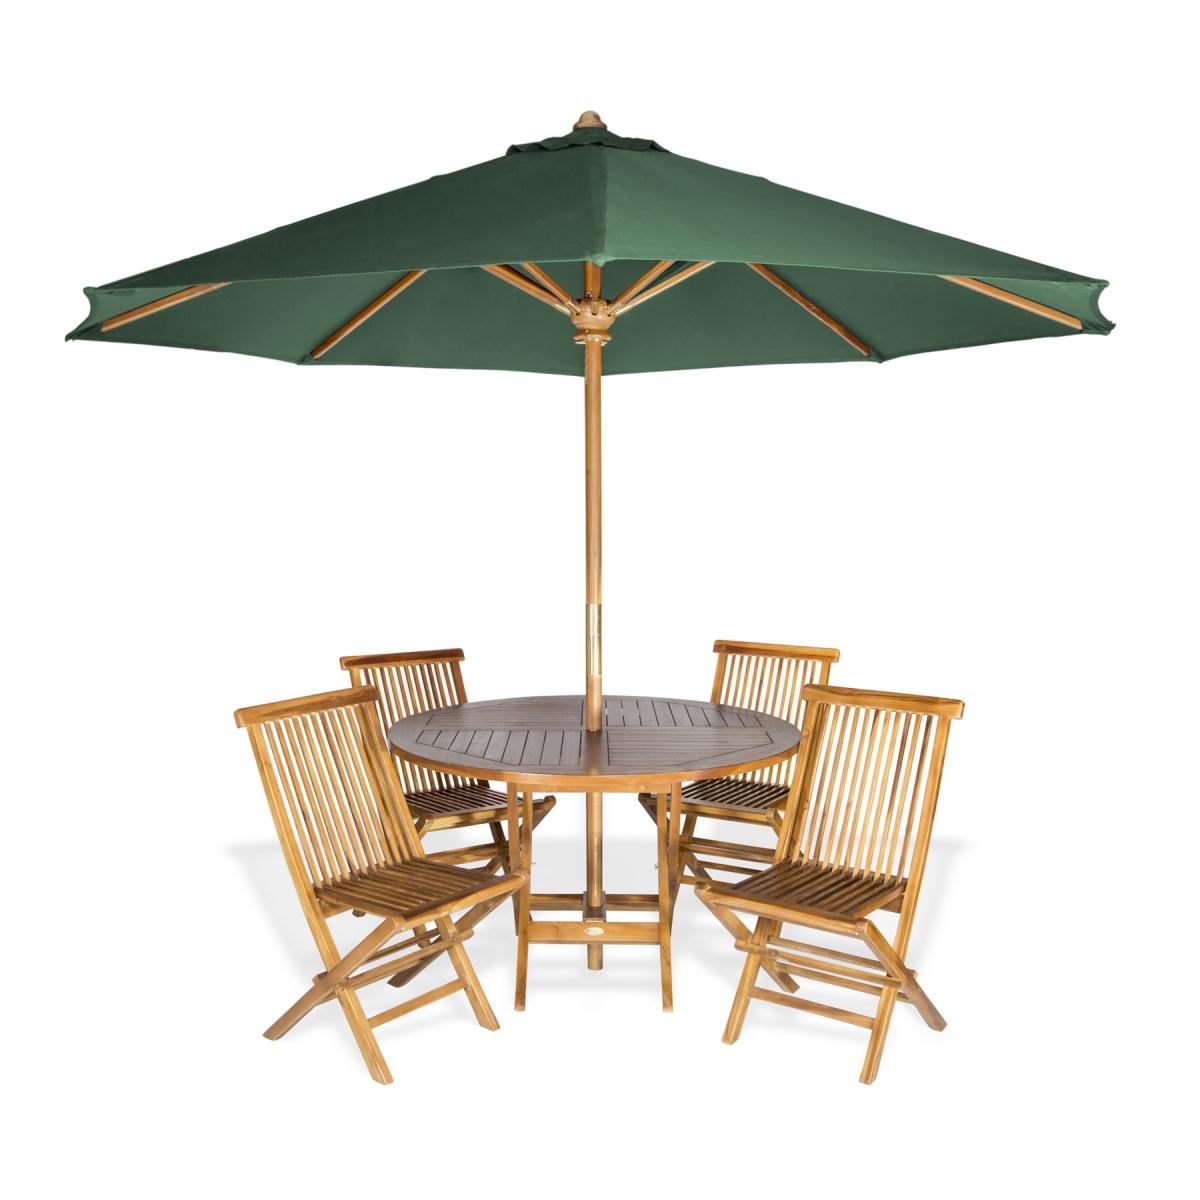 6-Piece Round Folding Table Set & Umbrella, Green - All Things Cedar TT6P-R-G